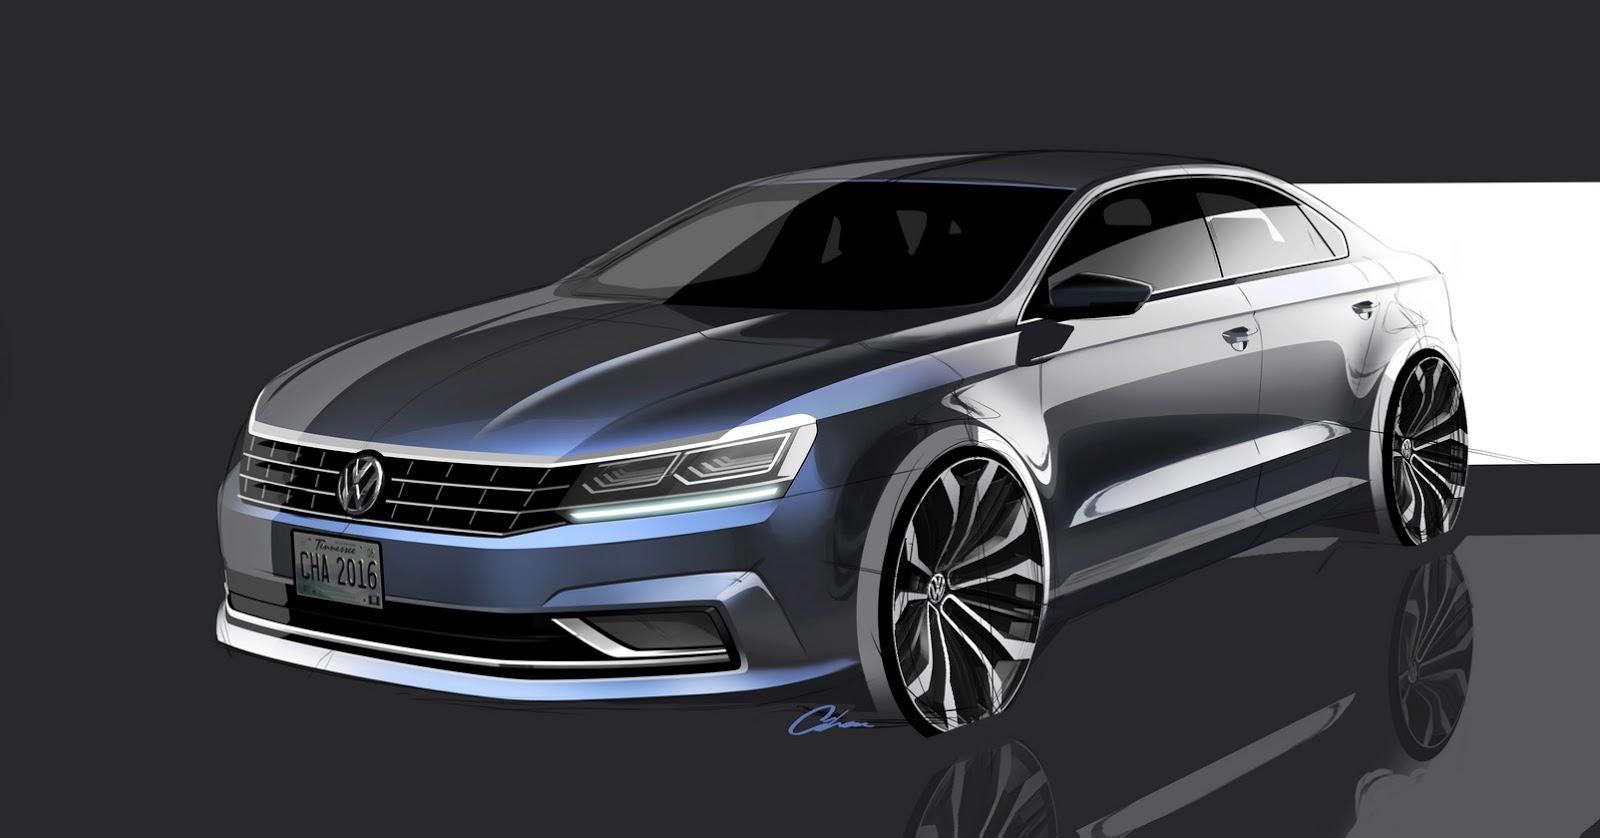 Car Display Wallpaper Vw 2016 Volkswagen Passat U S Pricing Announced Autoevolution